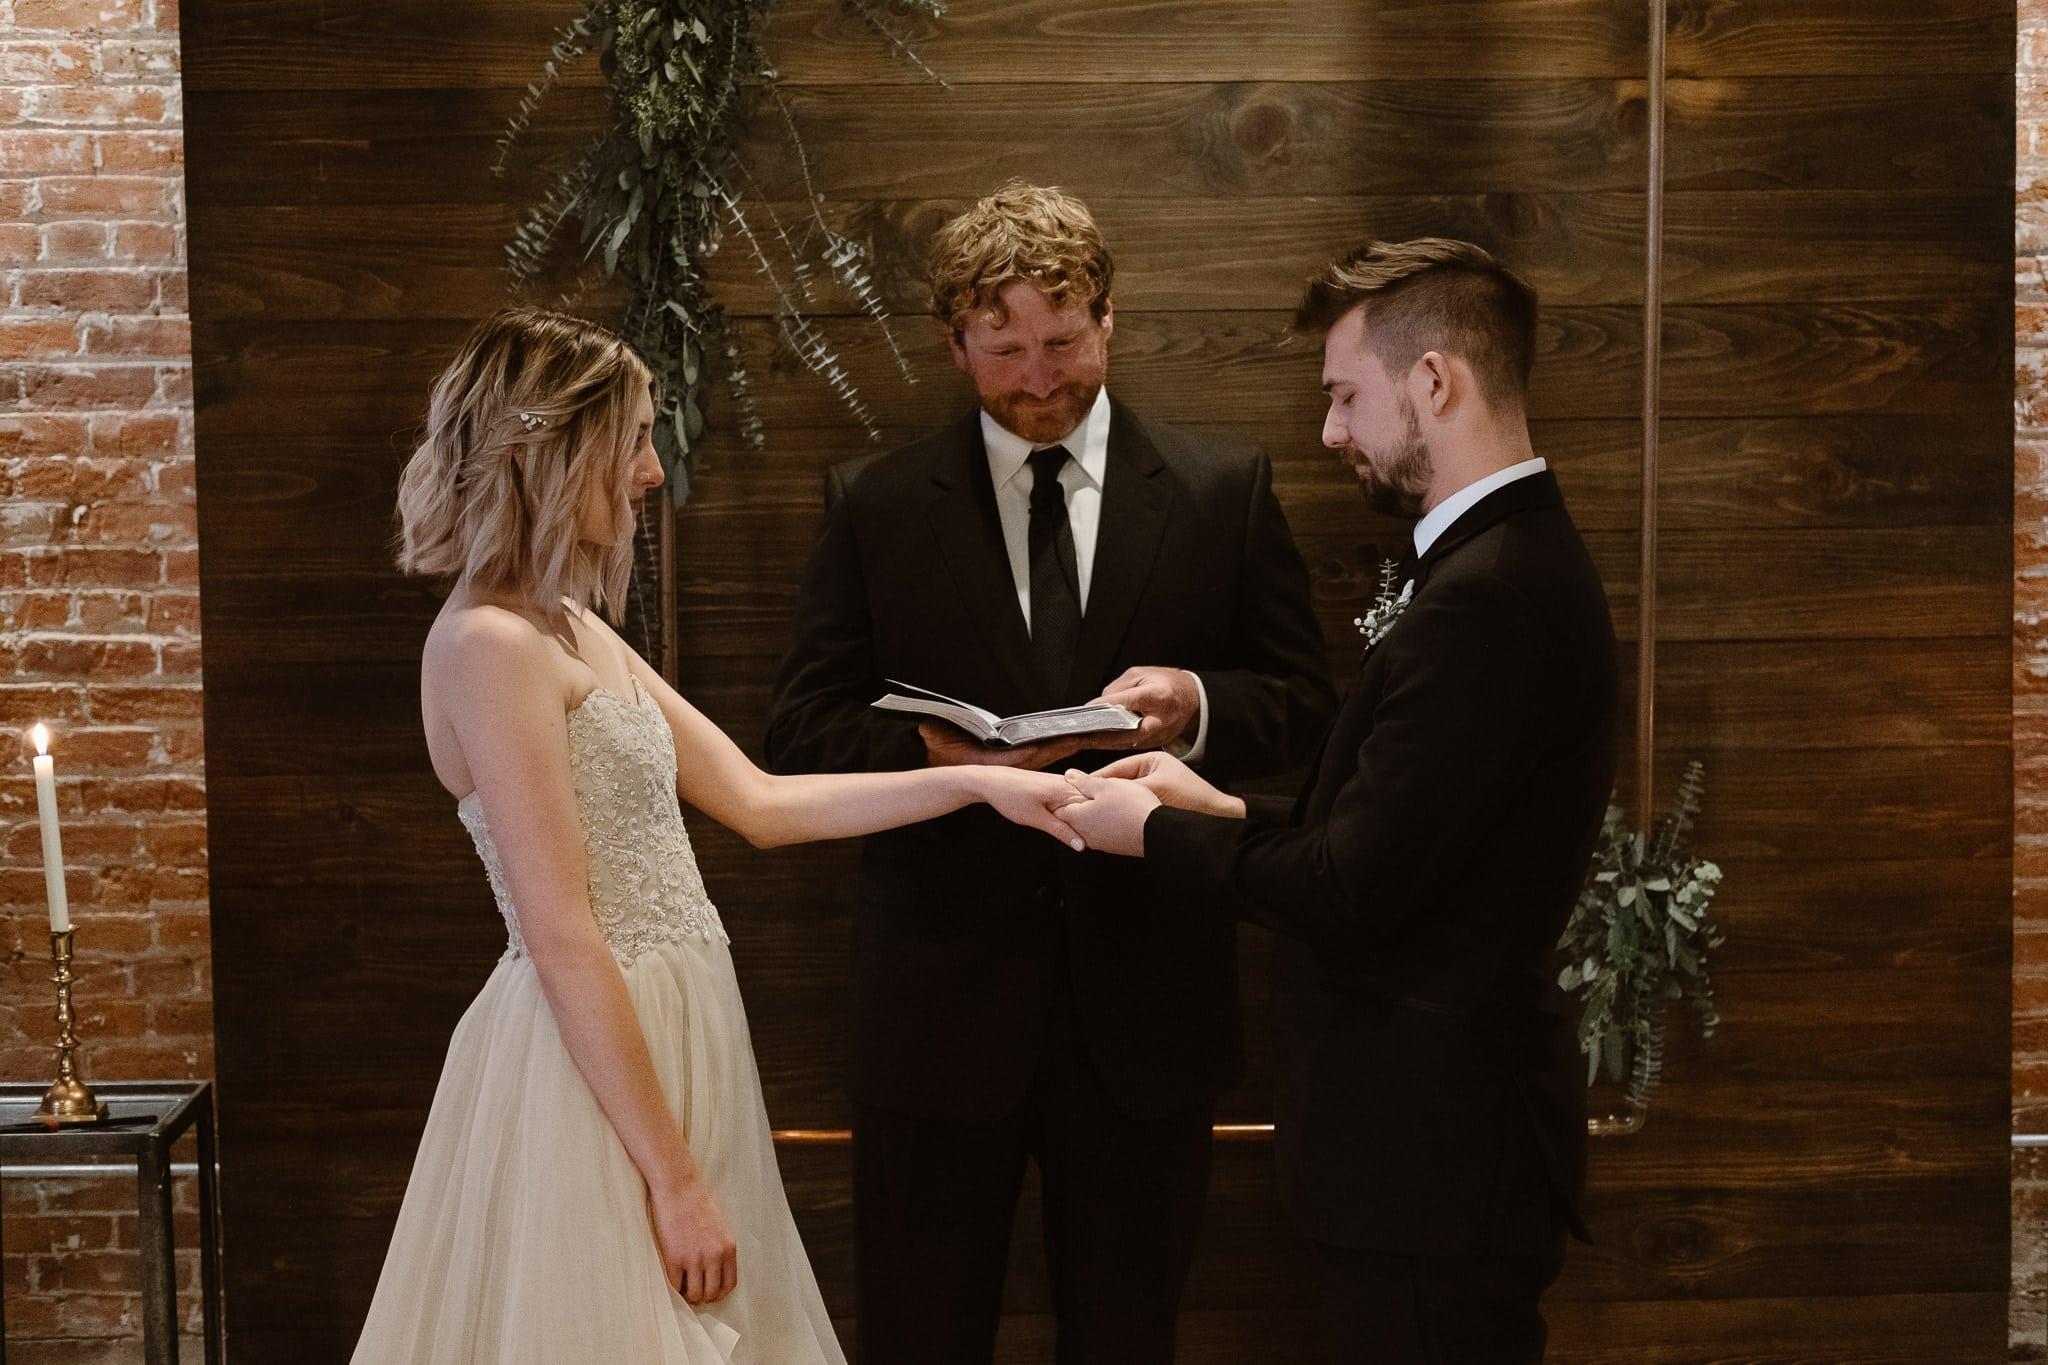 St Vrain Wedding Photographer | Longmont Wedding Photographer | Colorado Winter Wedding Photographer, Colorado industrial chic wedding ceremony, wedding ring exchange